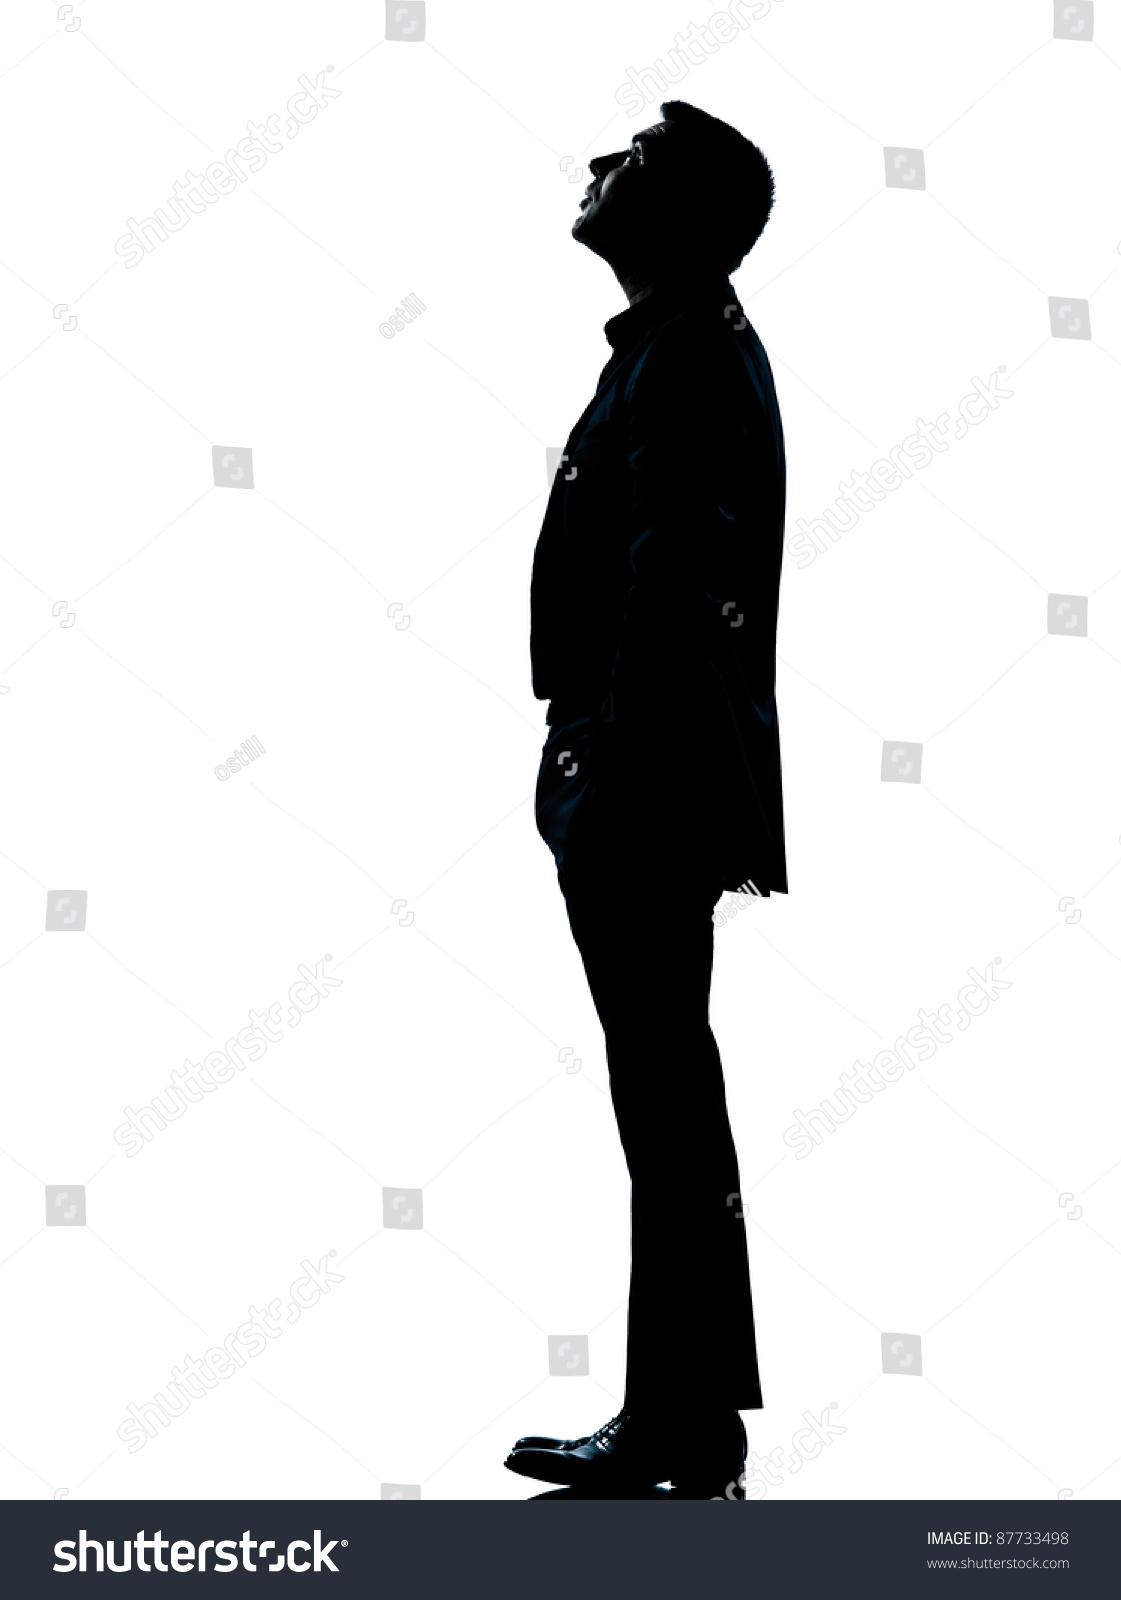 Man standing up sideways one caucasian business man silhouette